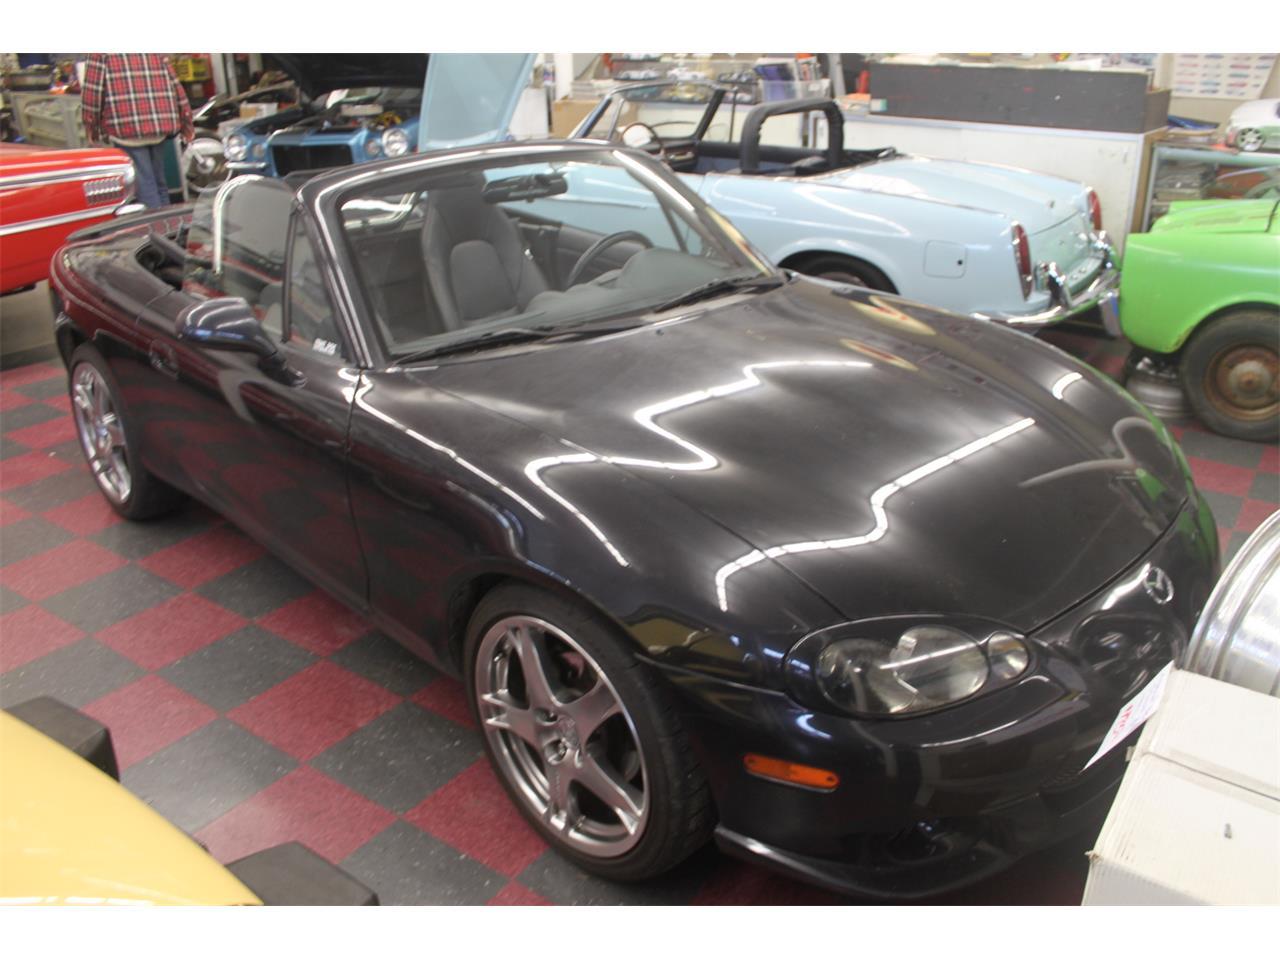 2005 Mazda Miata (CC-1188868) for sale in Carnation, Washington